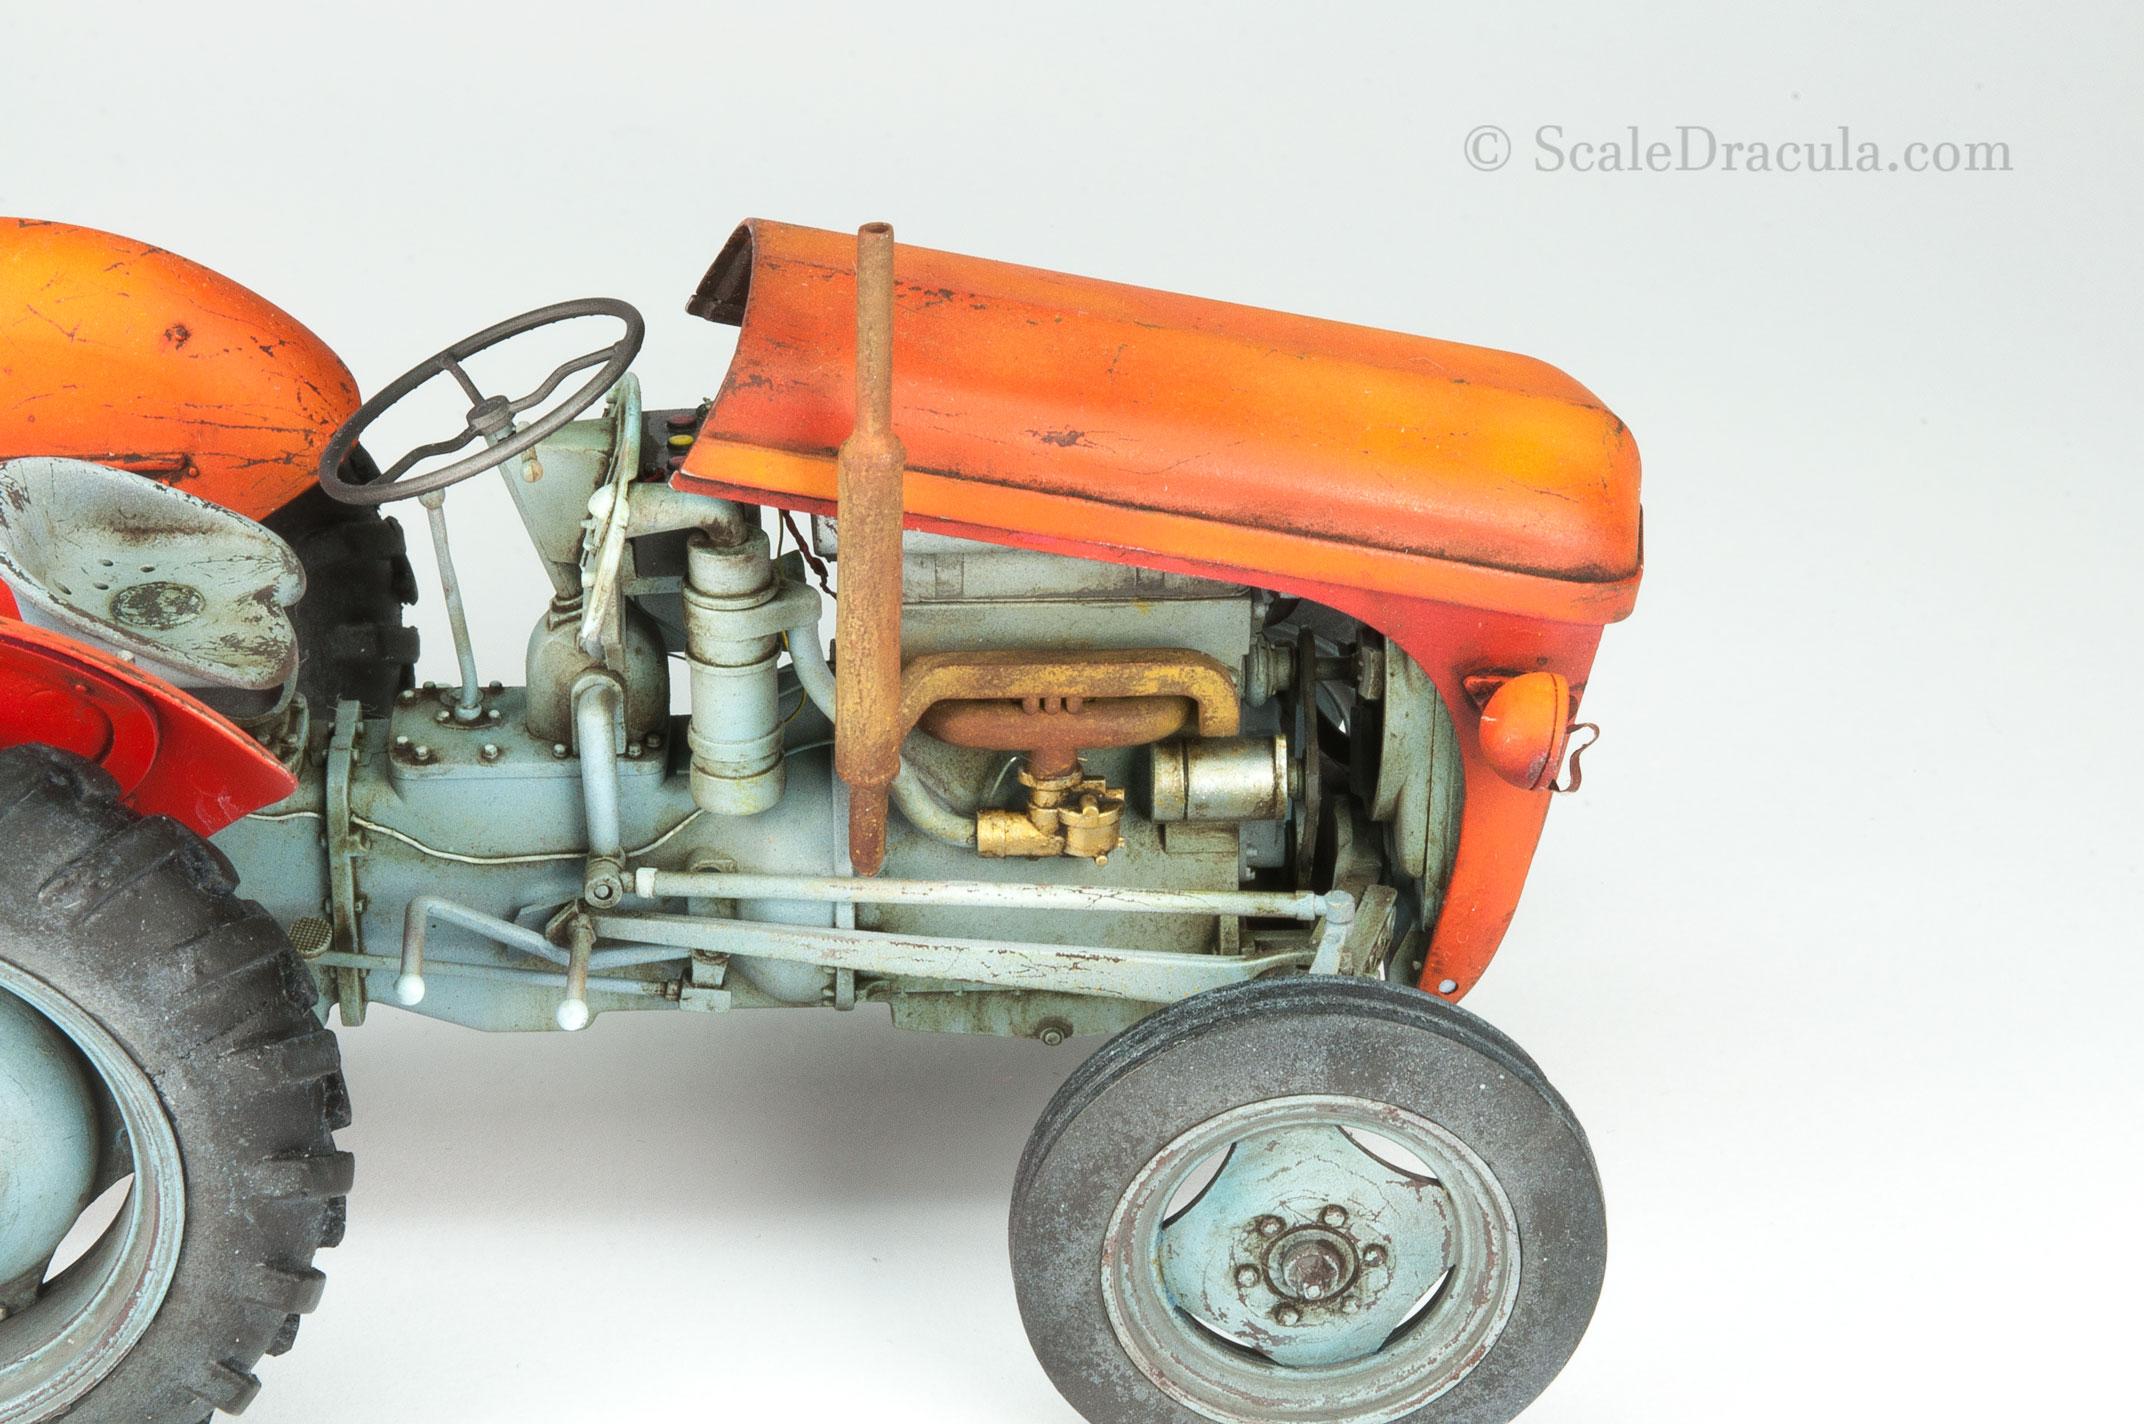 Details of engine before weathering 2, Ferguson by Heller